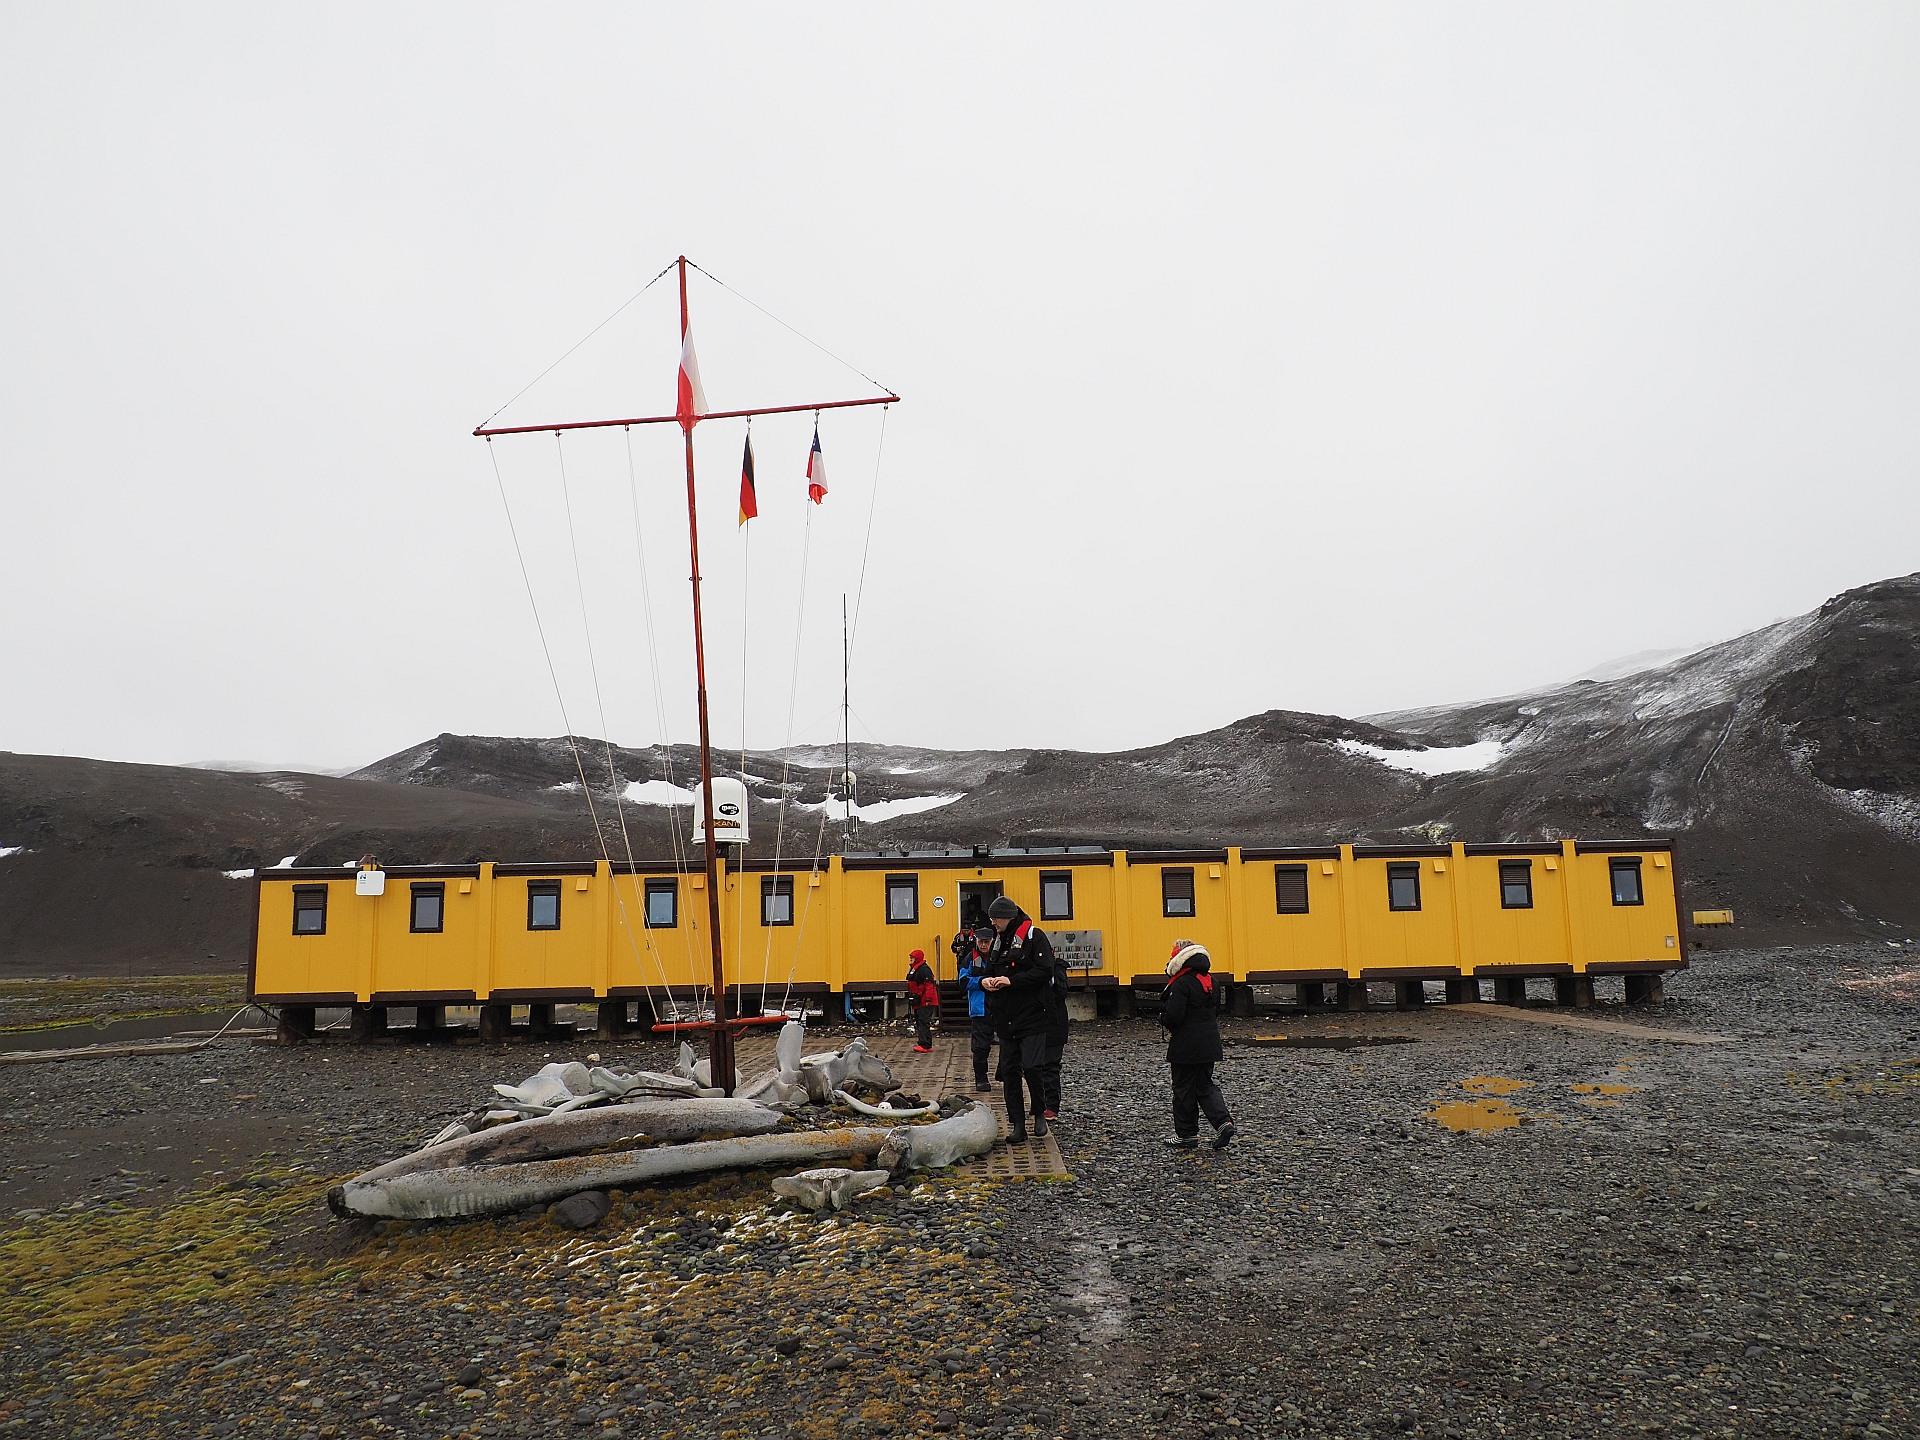 Forschungsstation Arctowski